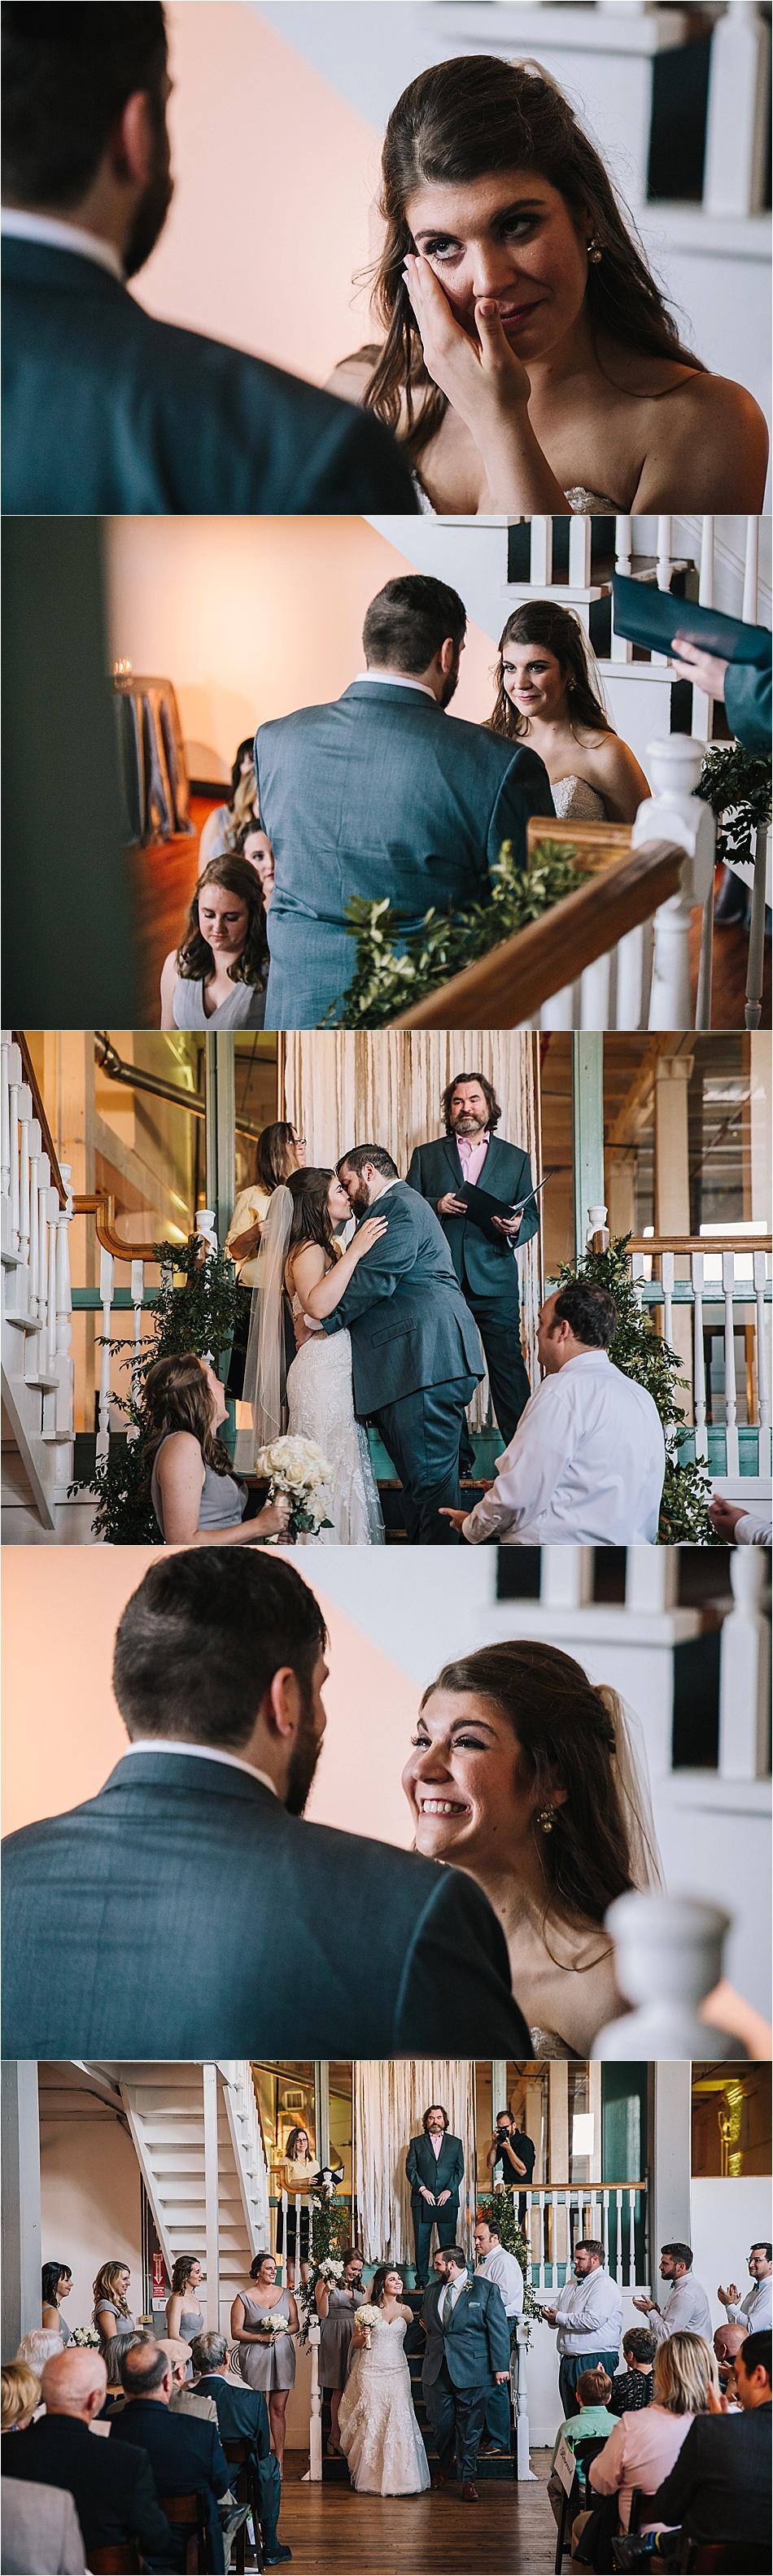 CK-Photo-Nashville-Wedding-Photographer-_0027.jpg